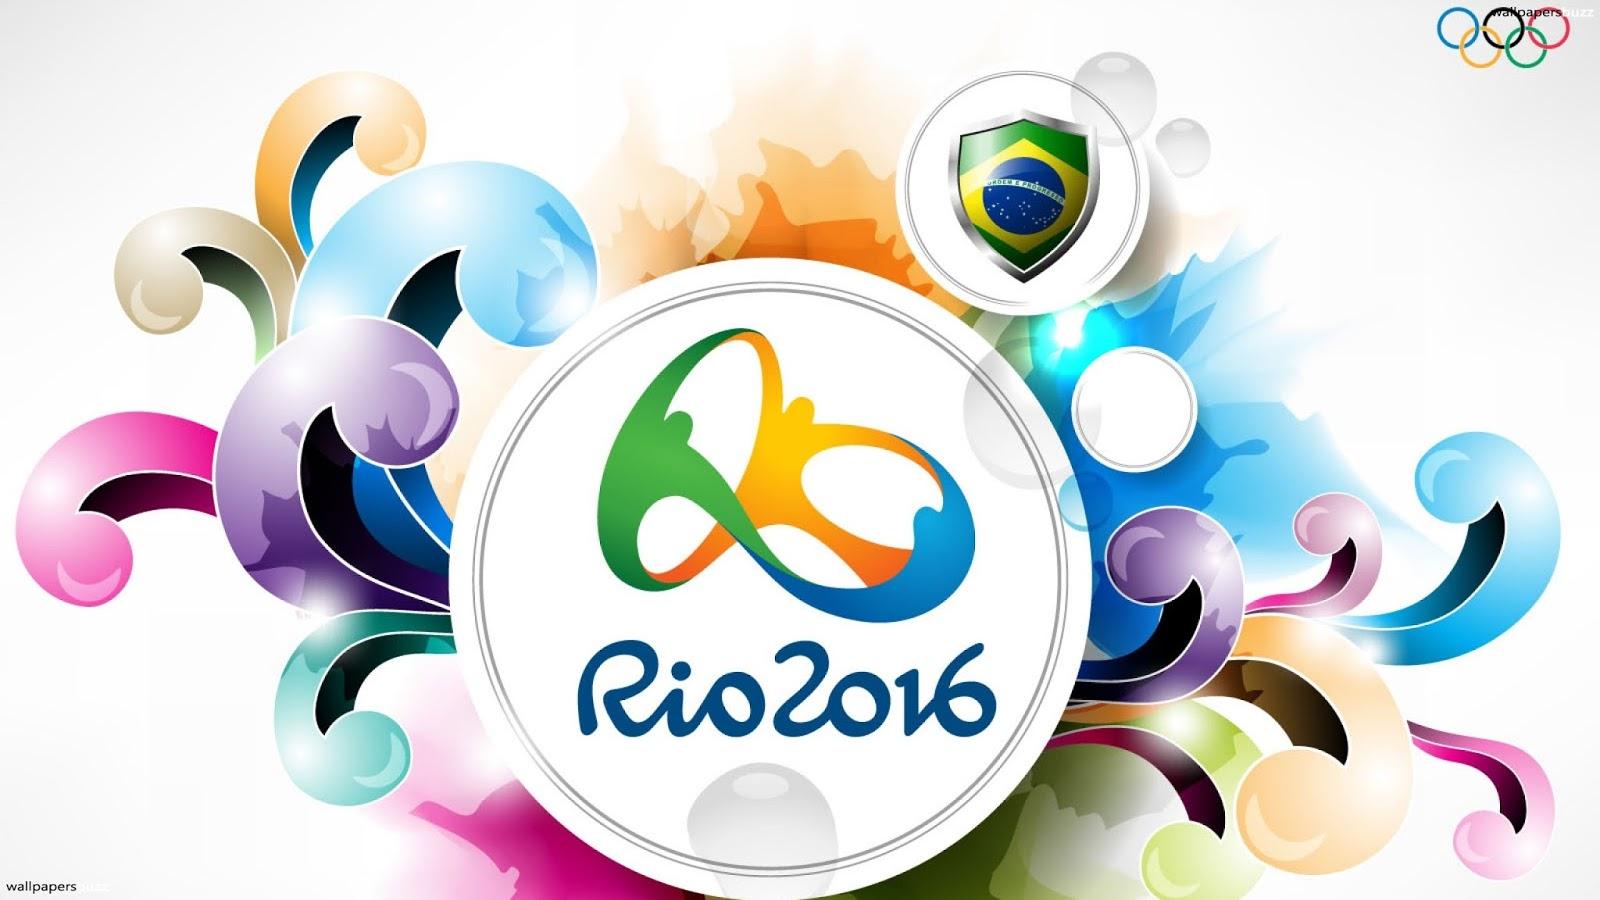 Sandra De Sá - Olhos Coloridos: testo tradotto - Canzone Olimpiadi RIO 2016 Traduzione